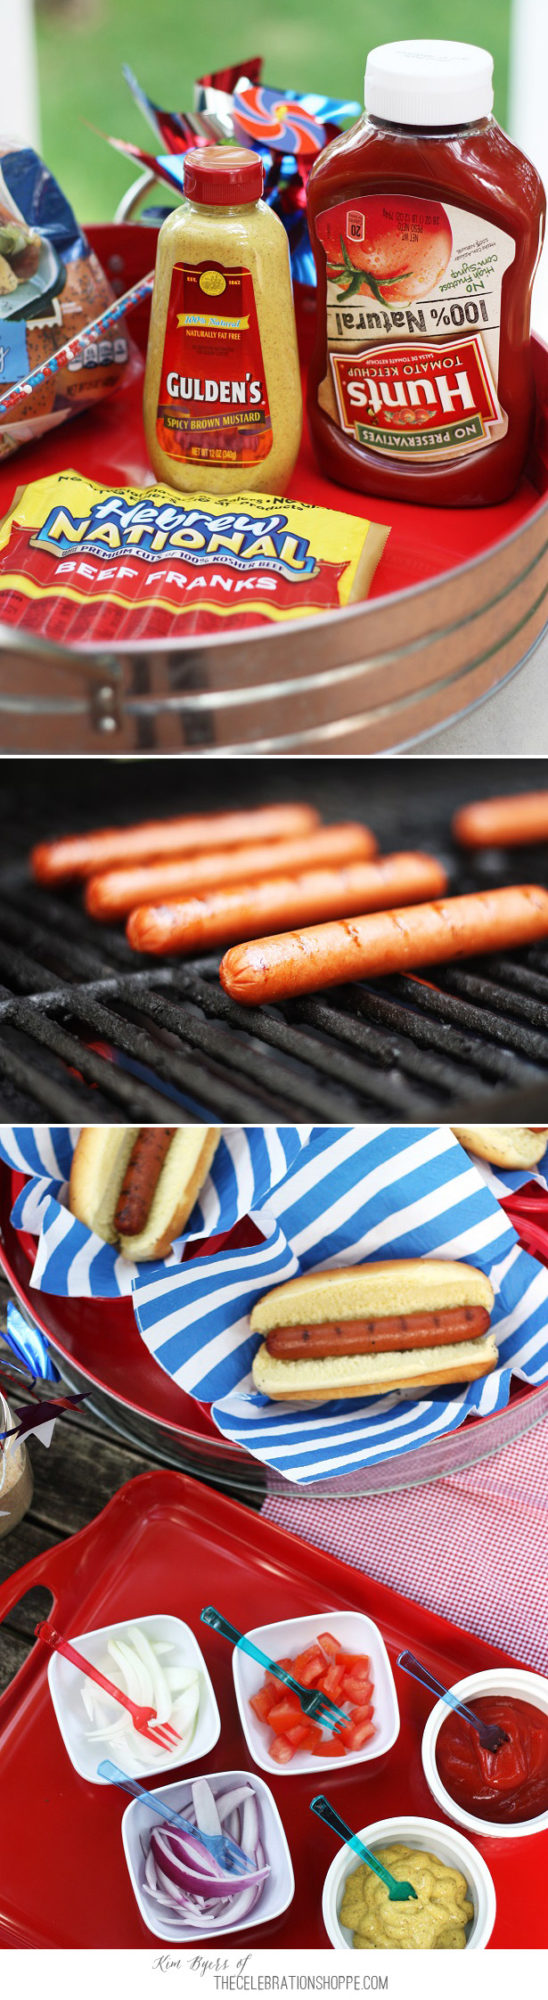 Summer Grilling & Make Your Own Hot Dog Bar   Kim Byers, TheCelebrationShoppe.com